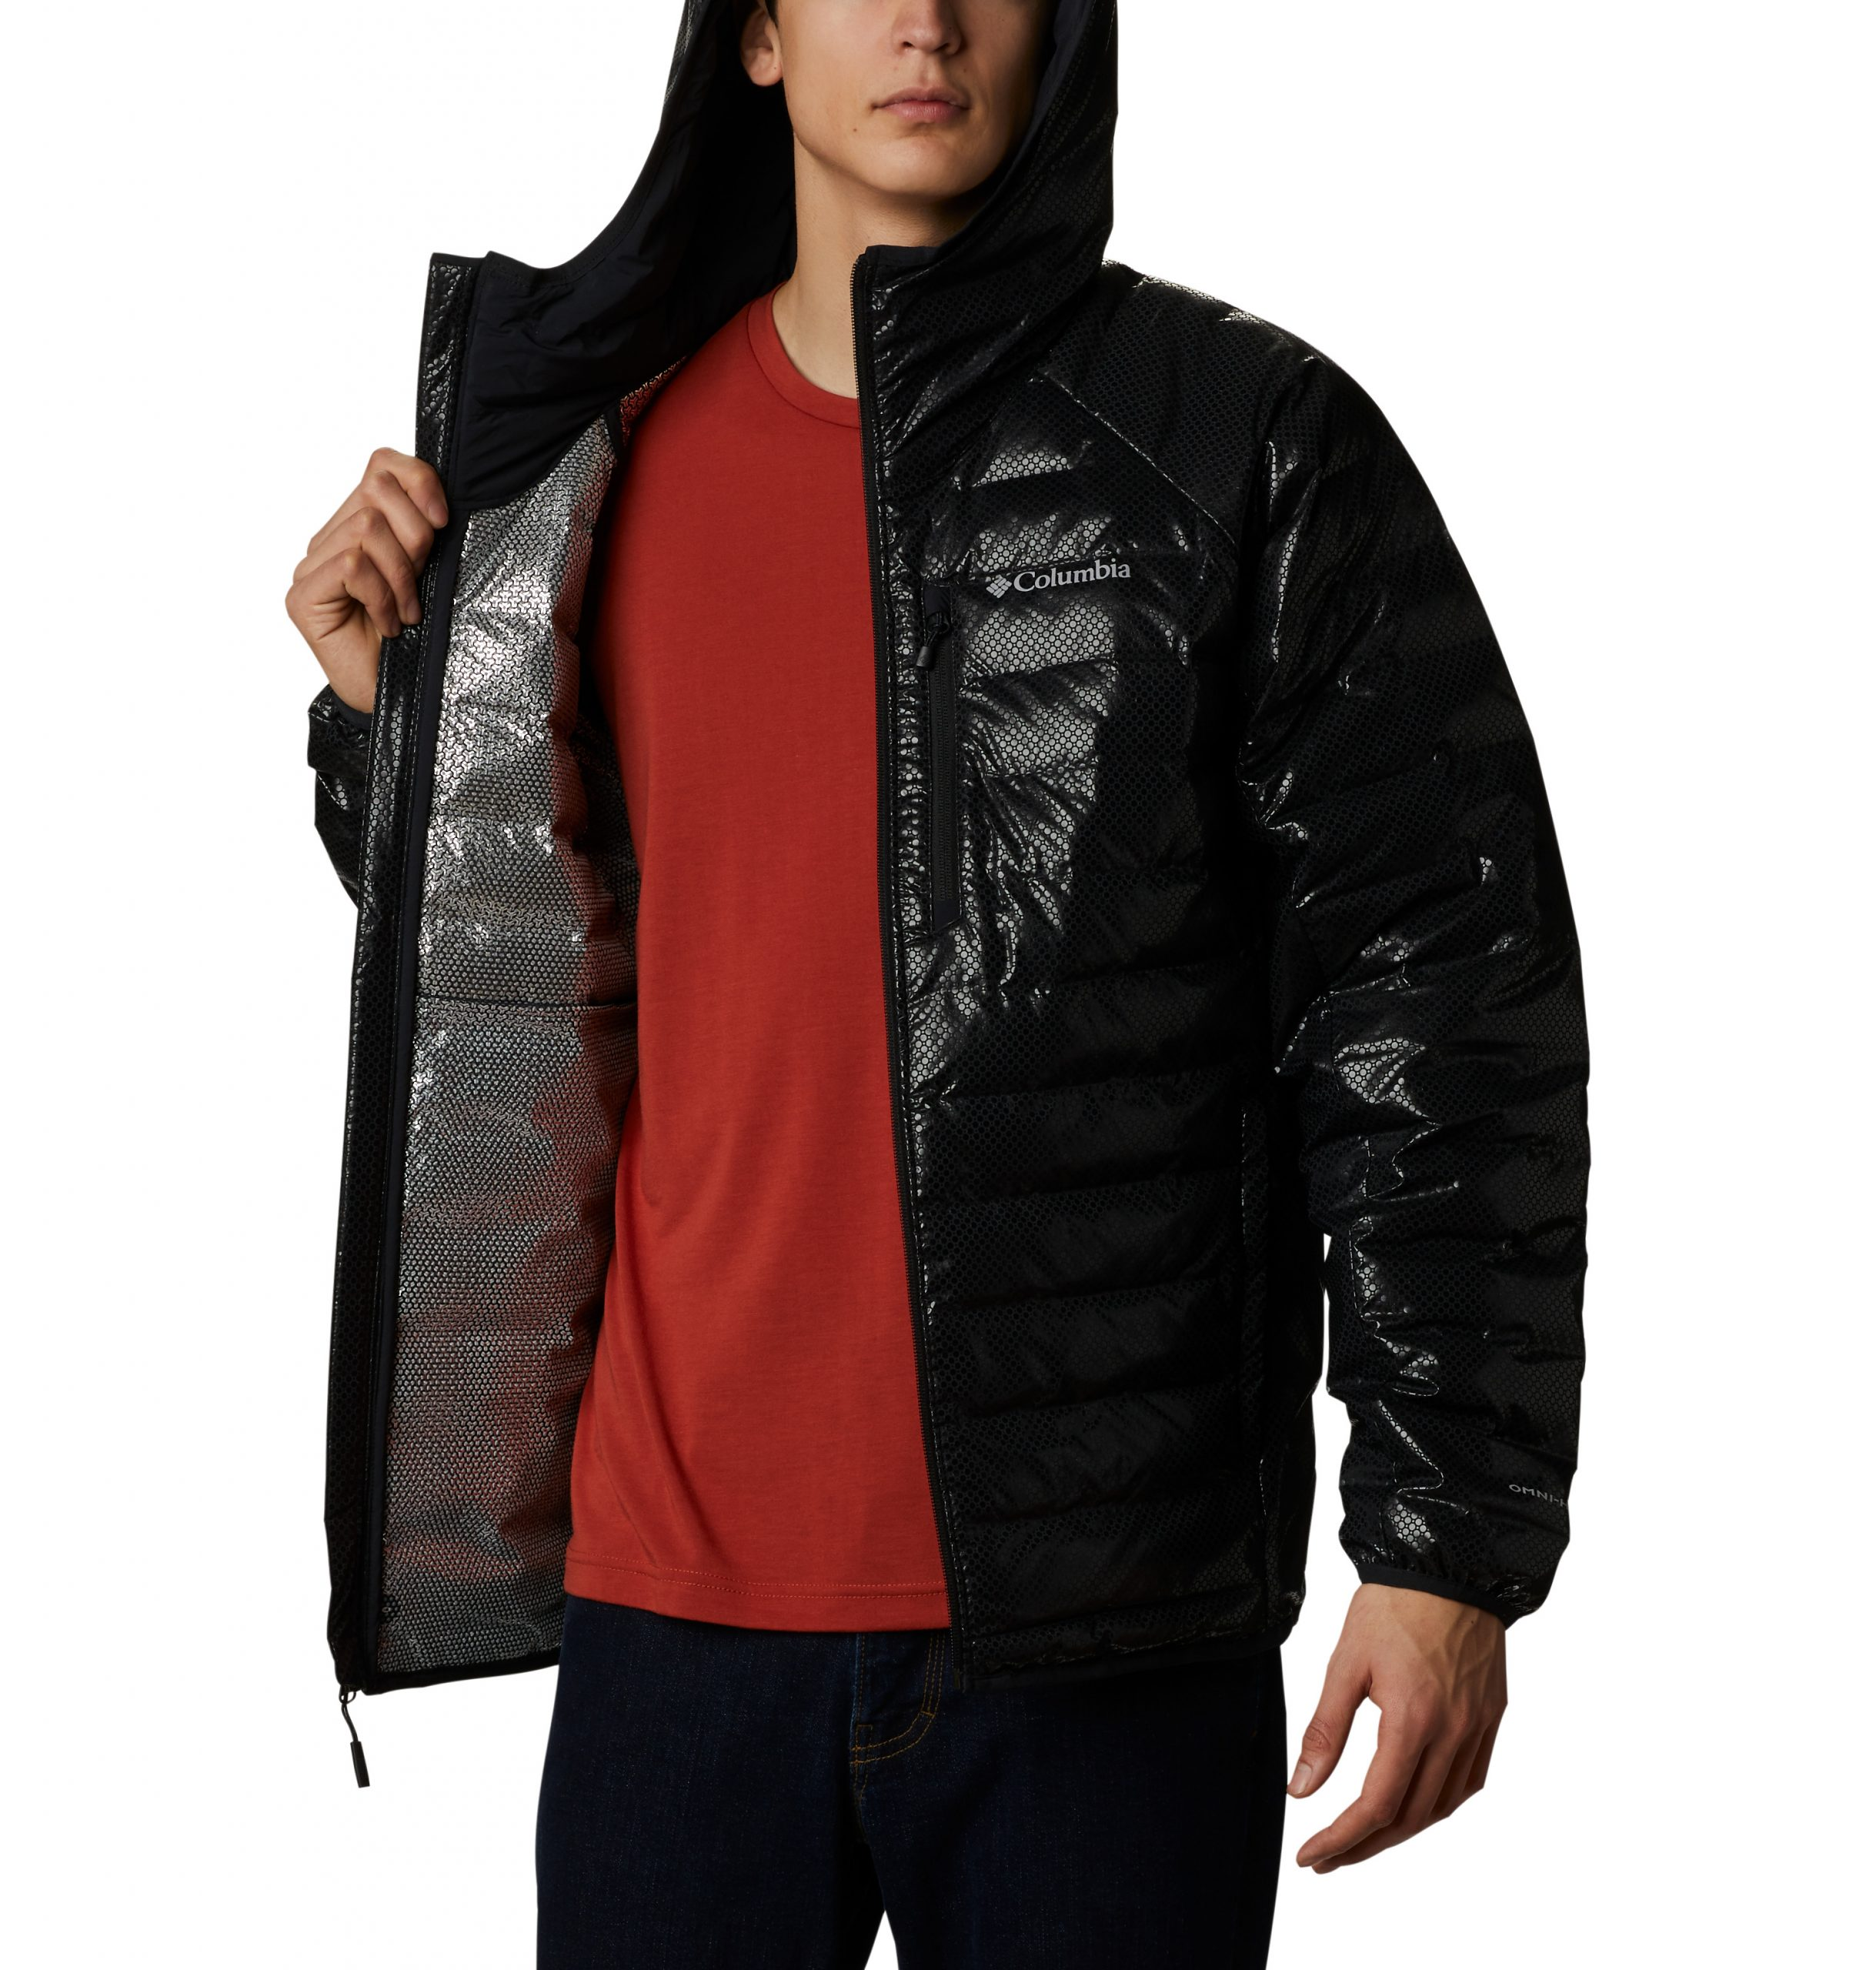 Men's Three Forks Black Dot Jacket V2